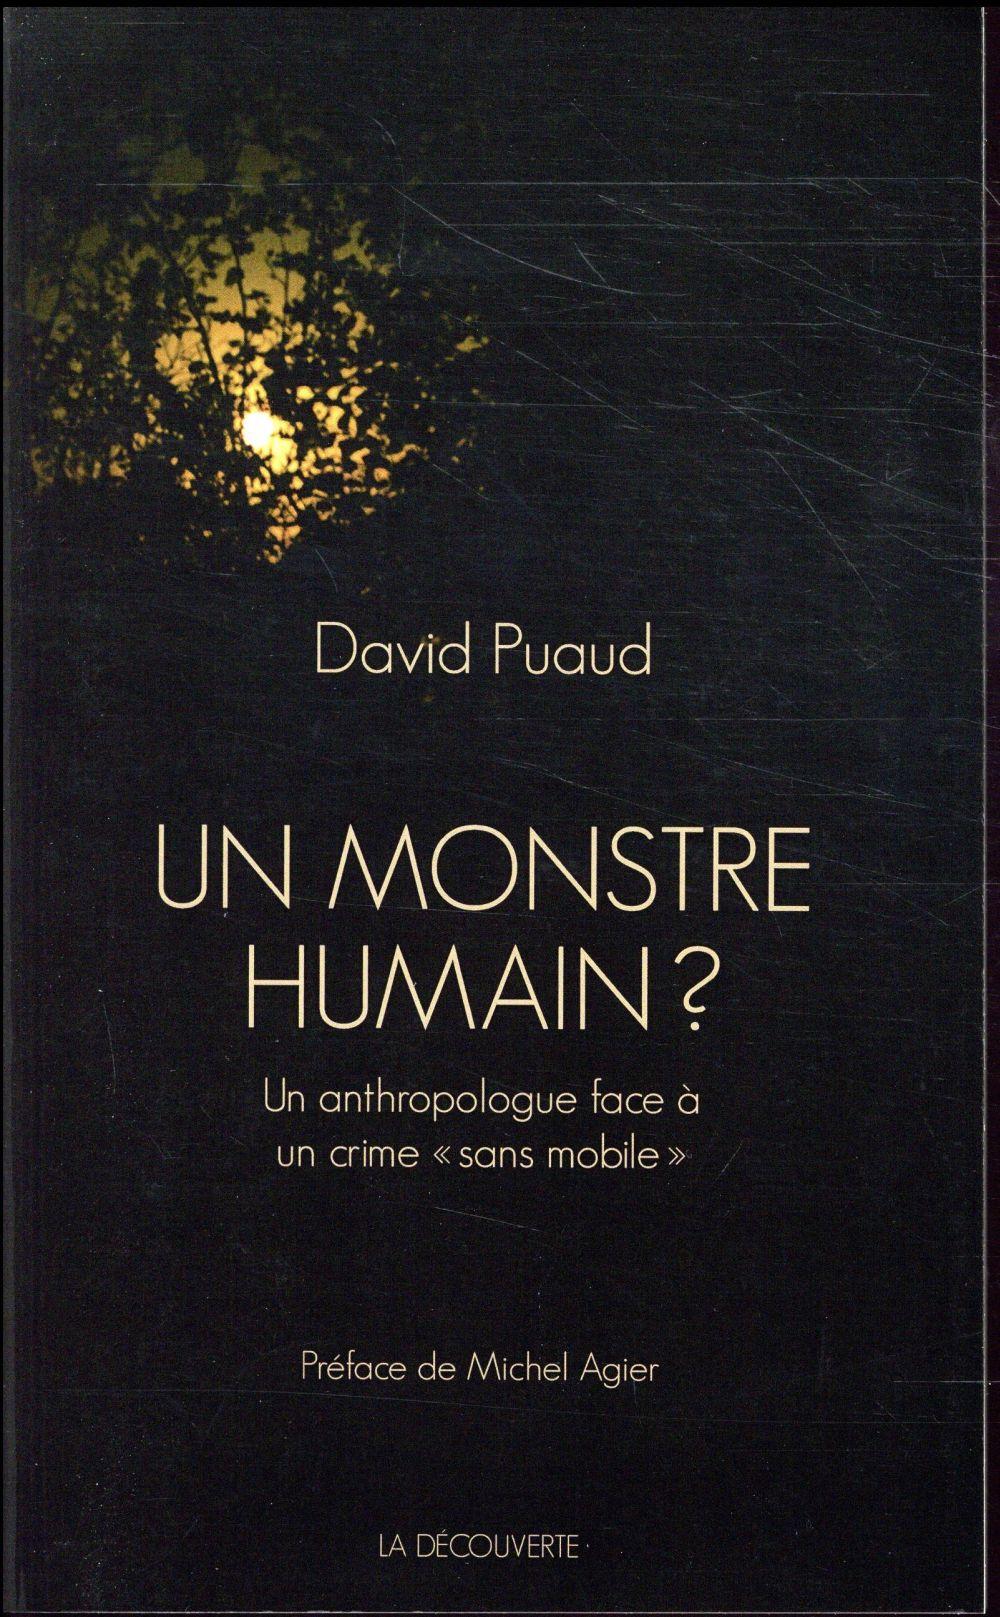 "UN MONSTRE HUMAIN ? UN ANTHROPOLOGUE FACE A UN CRIME ""SANS MOBILE""."